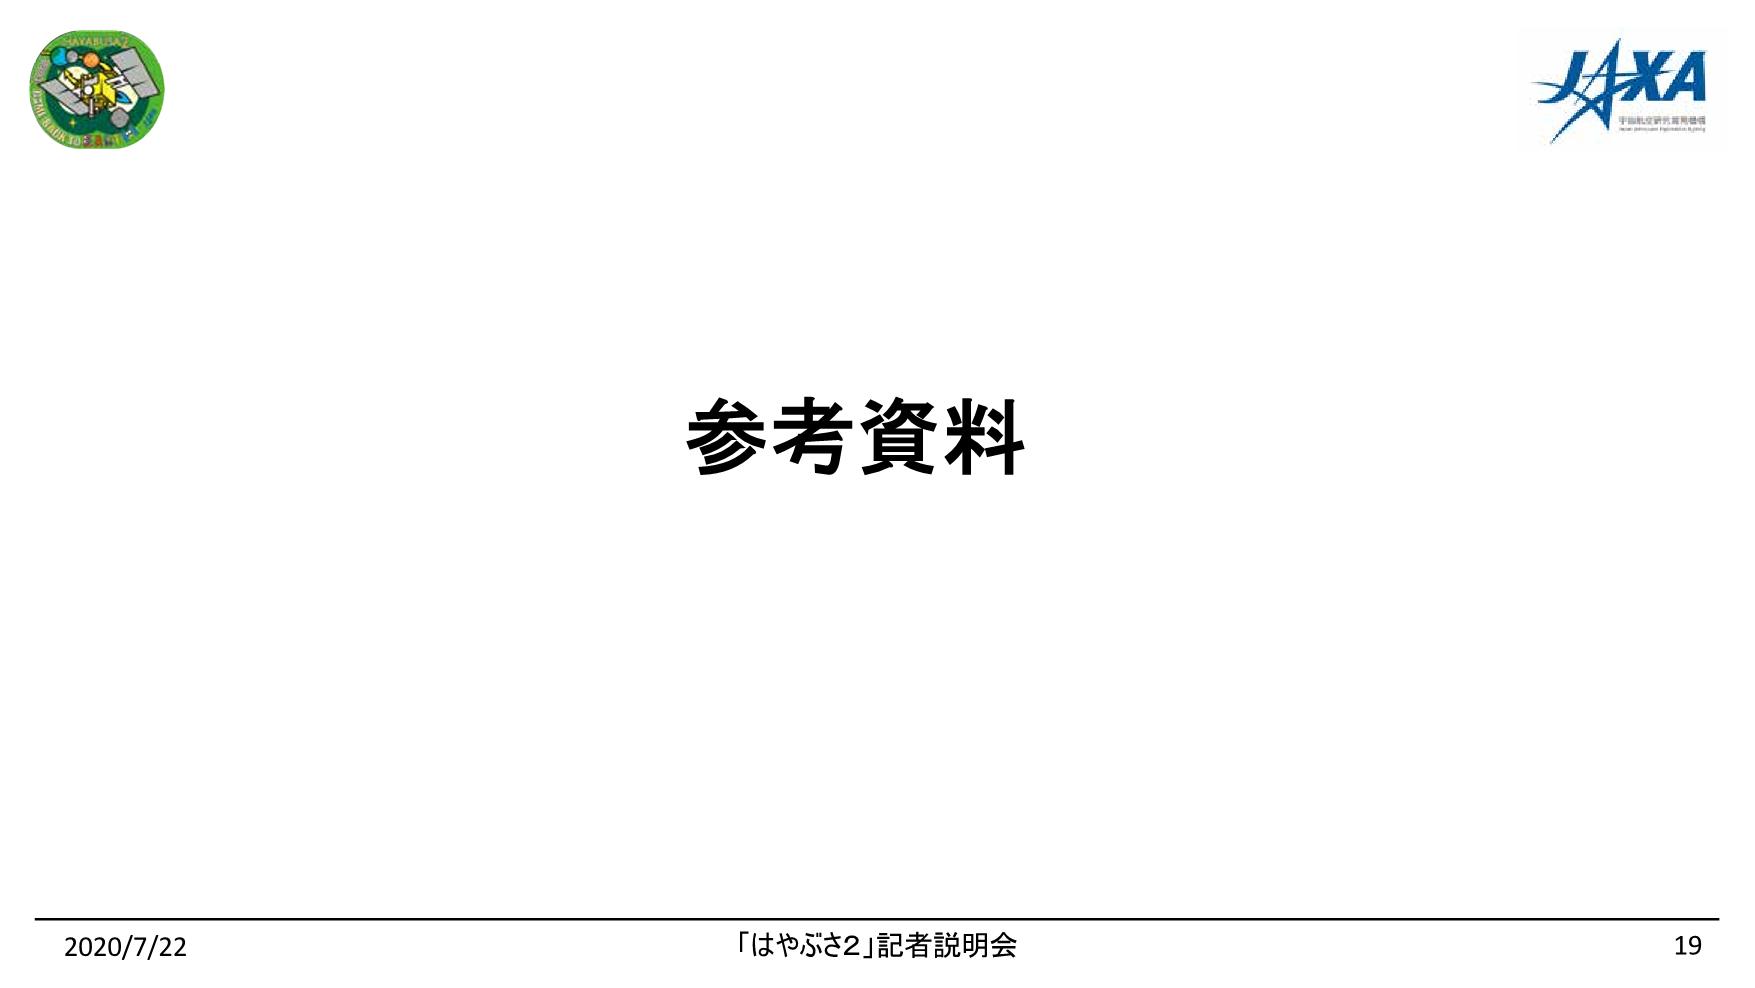 f:id:Imamura:20200722140803p:plain